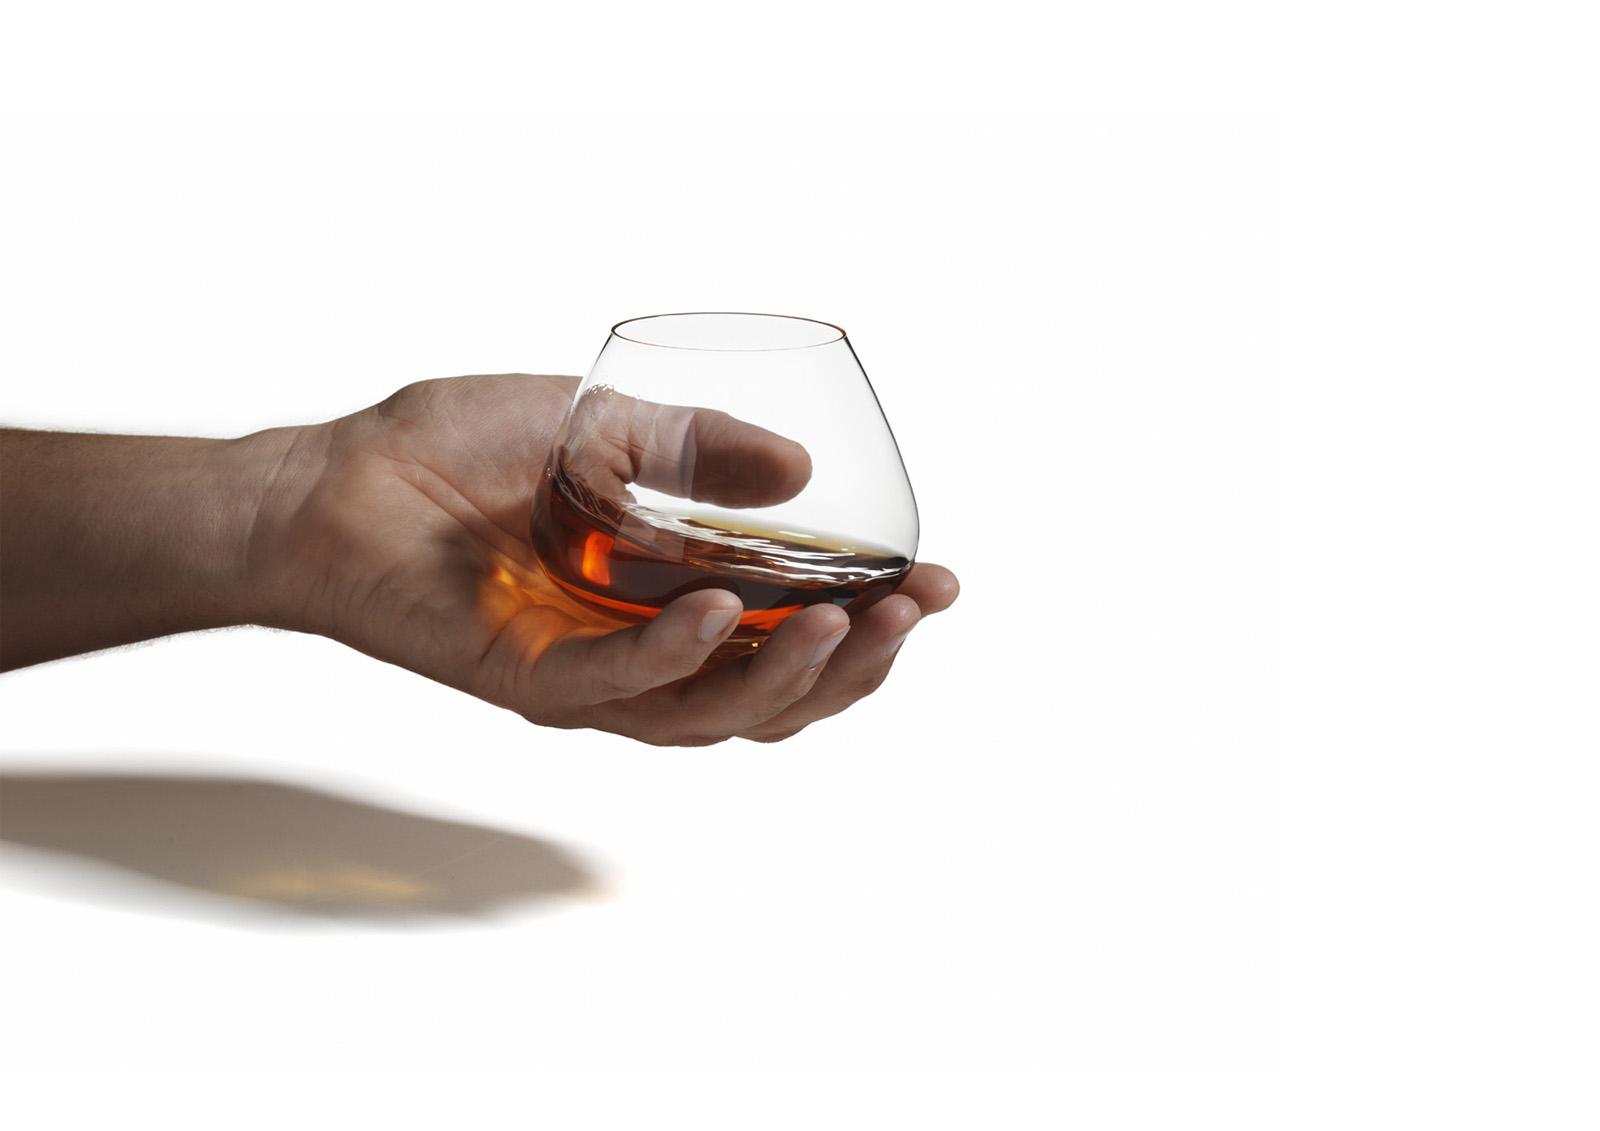 Normann Copenhagen Cognac Glasses by Rikke Hagen 01